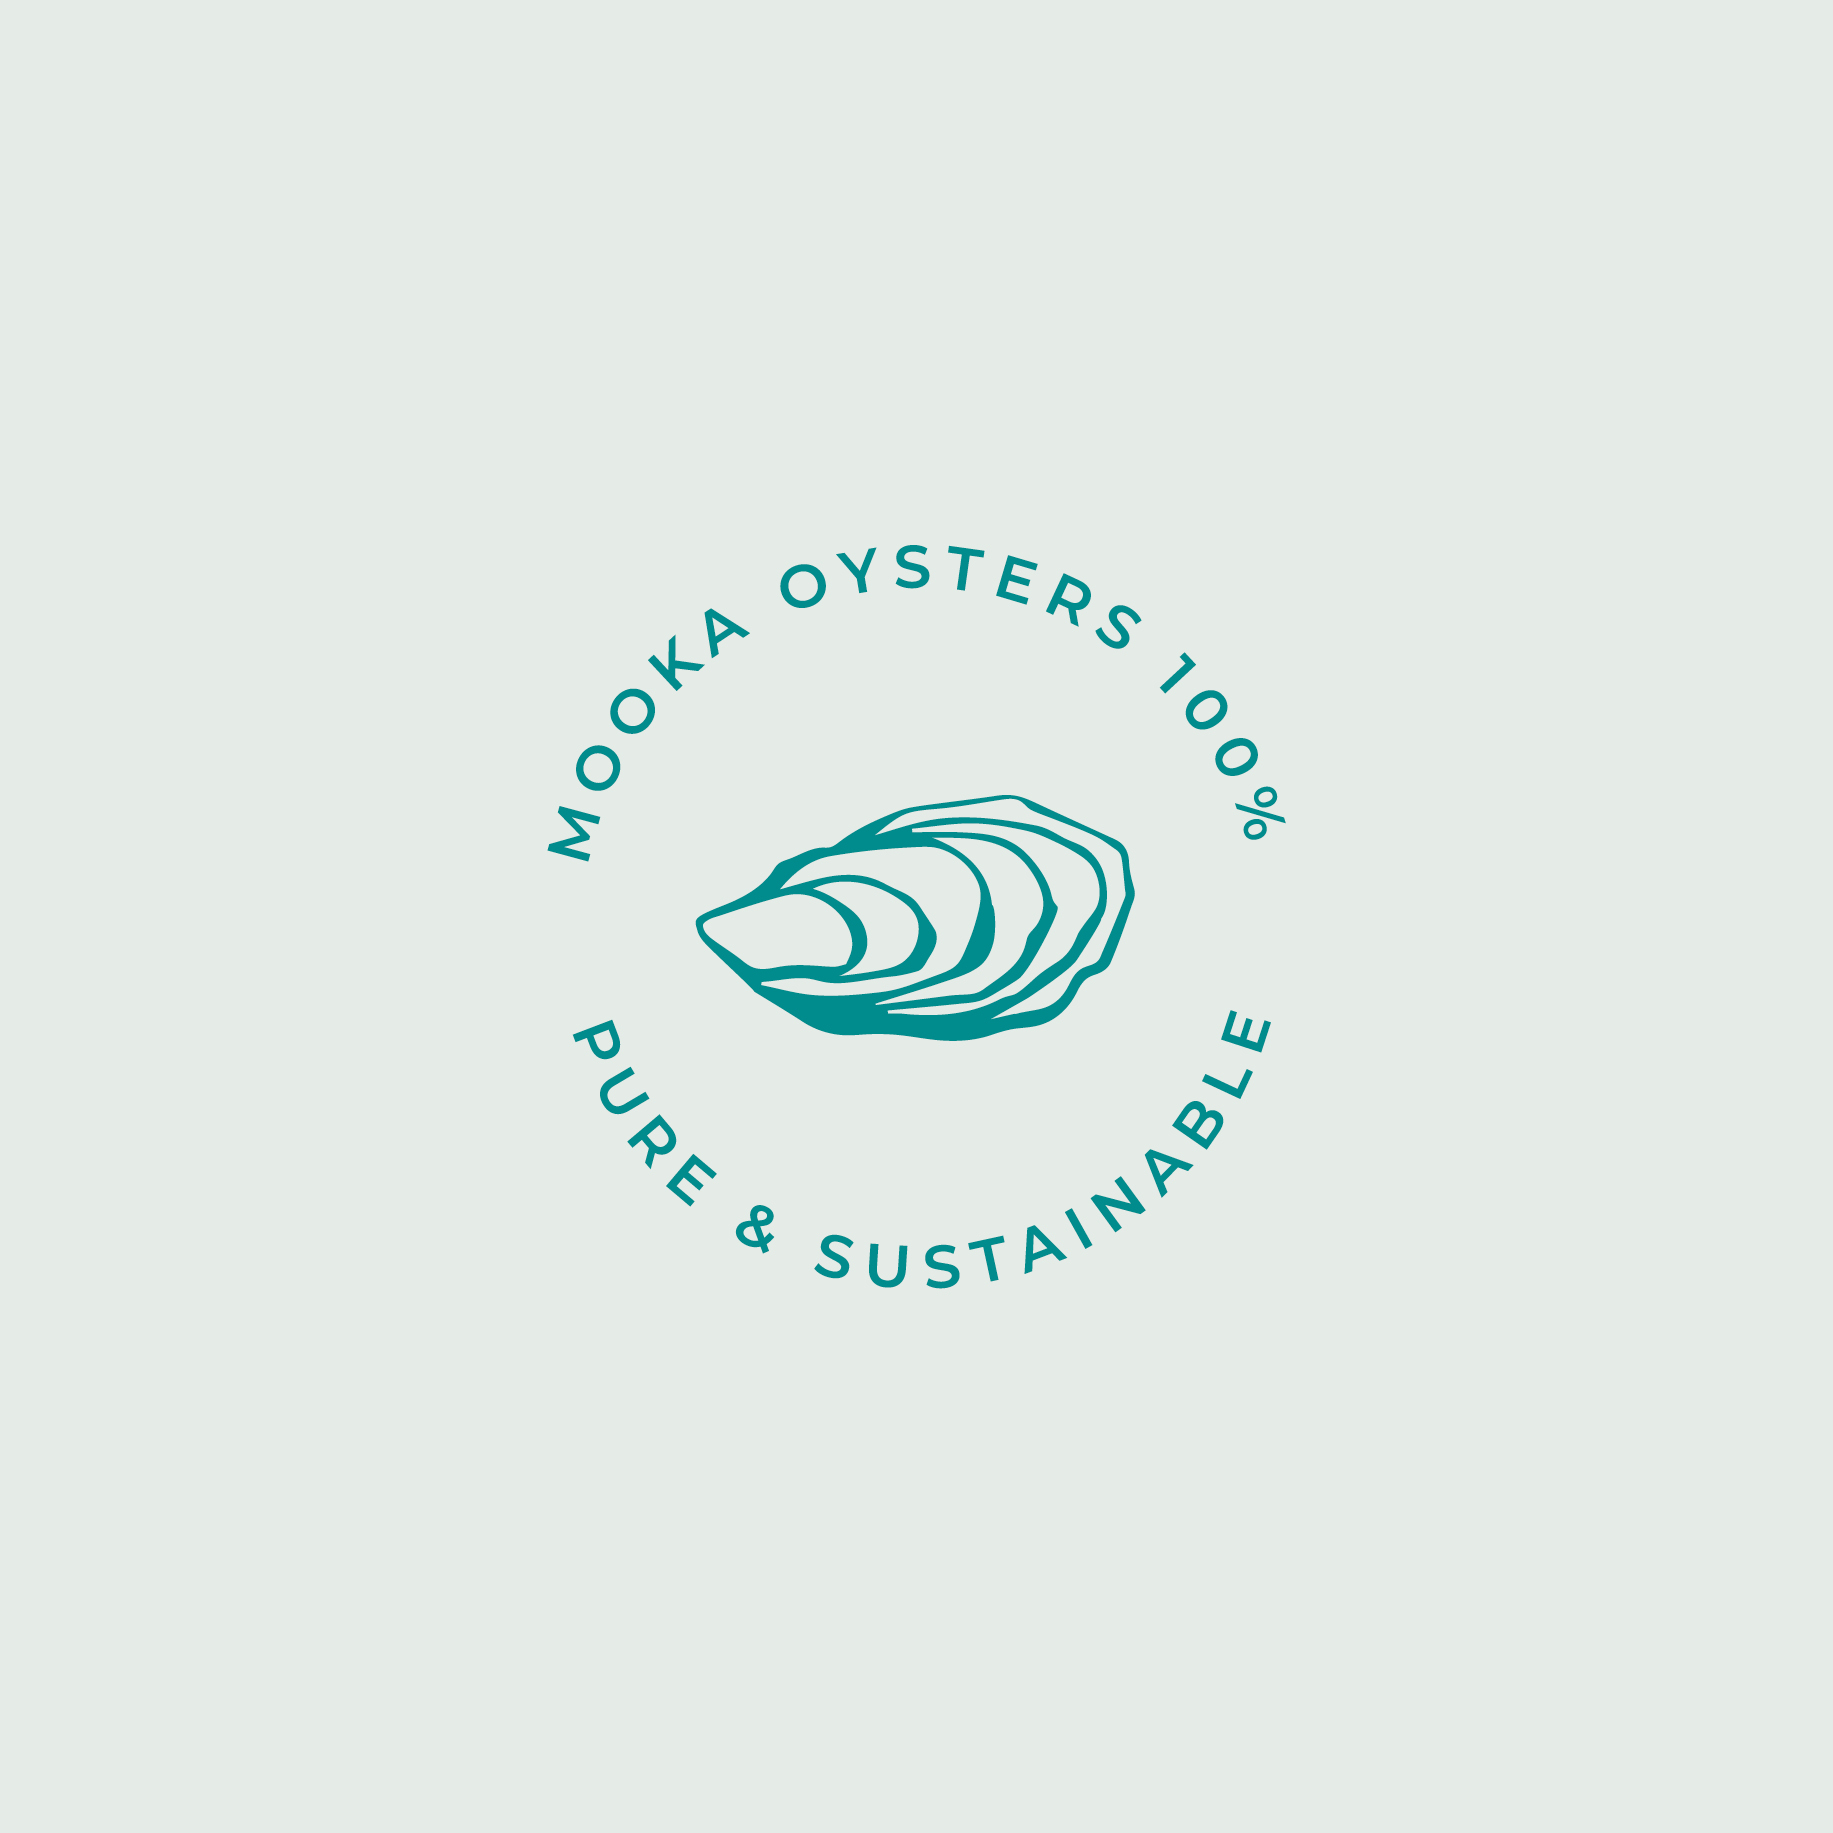 Mooka Oysters Brand Sub-Mark